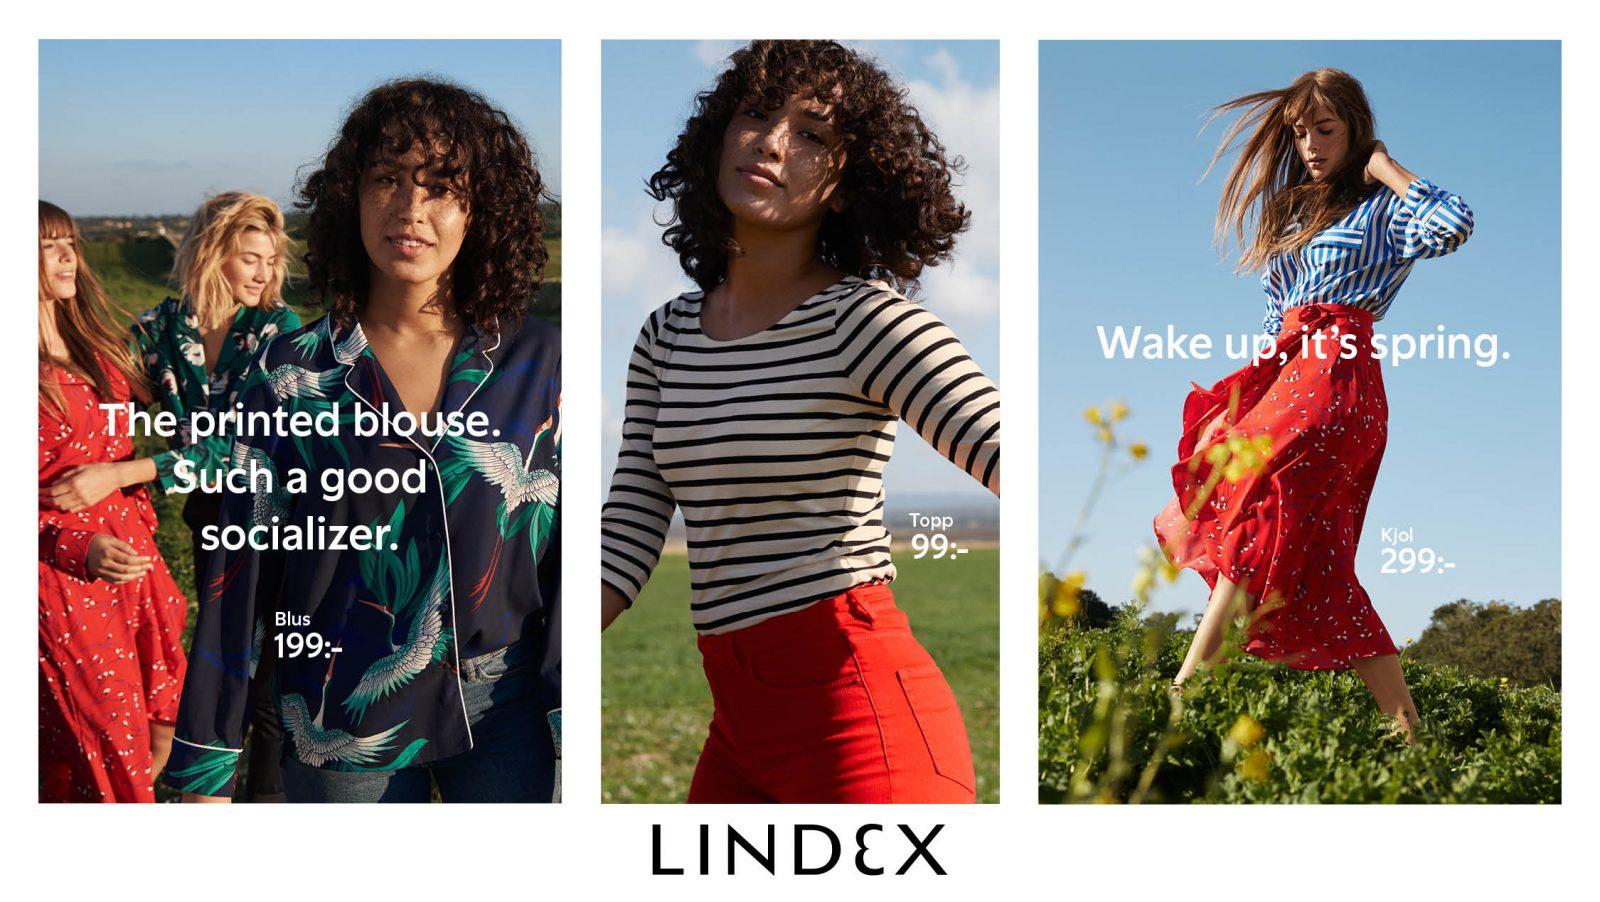 Lindex advertisement.